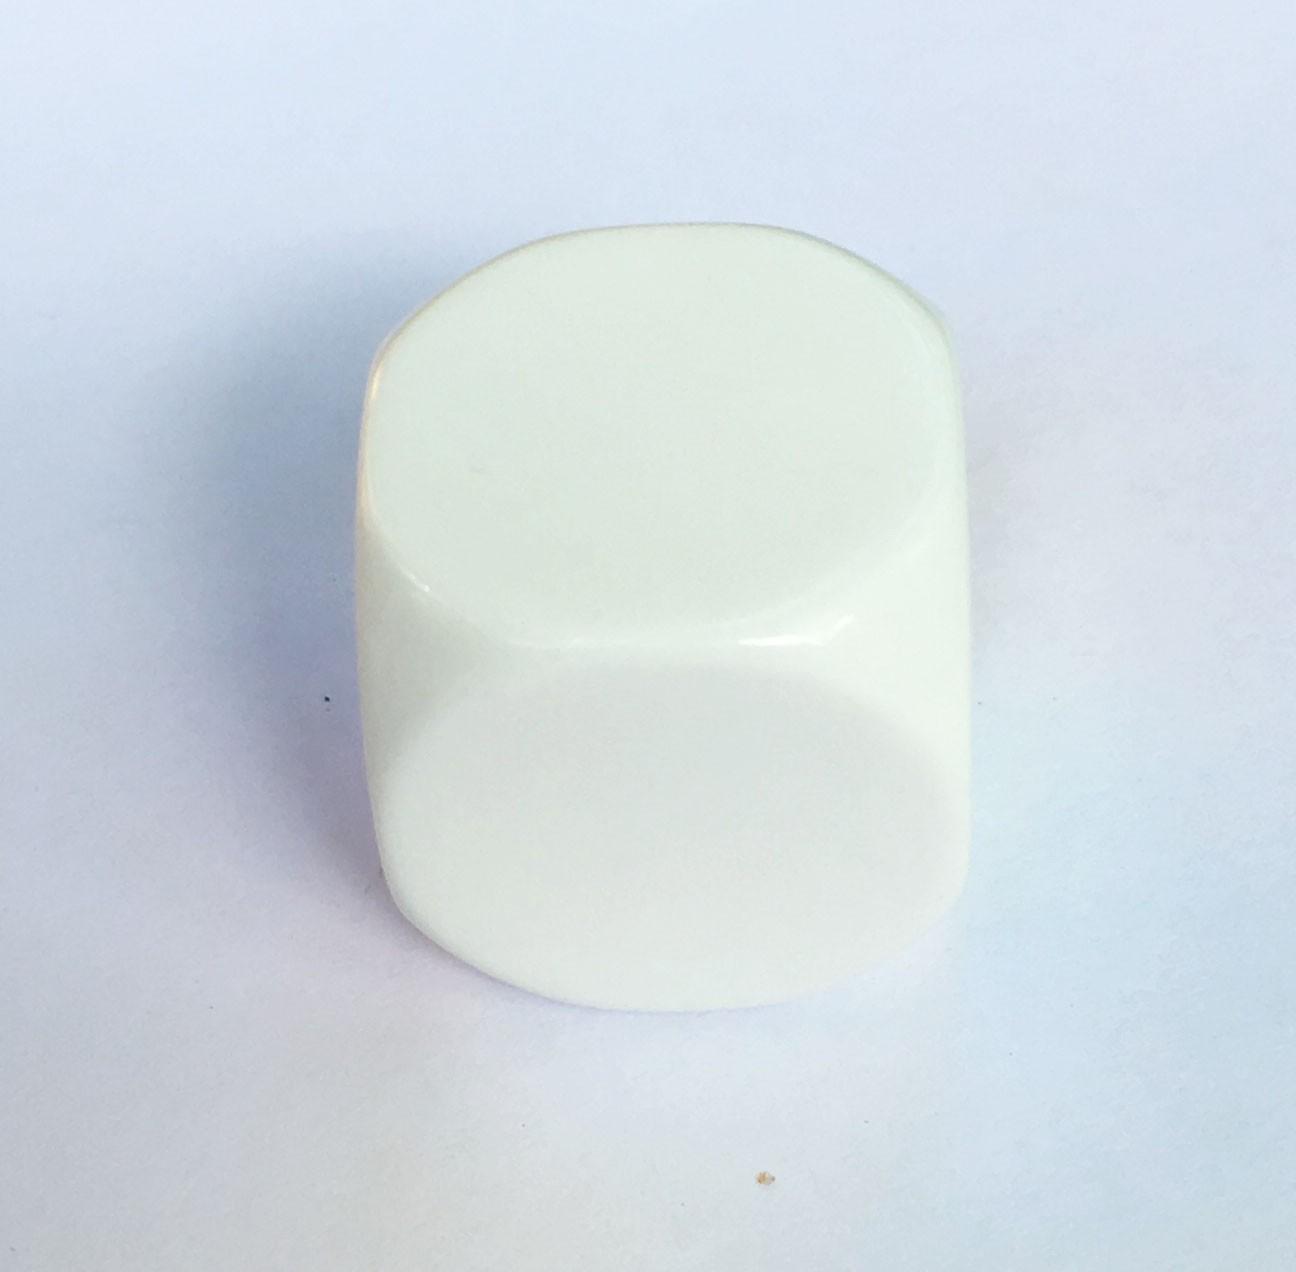 18mm Blank White Single